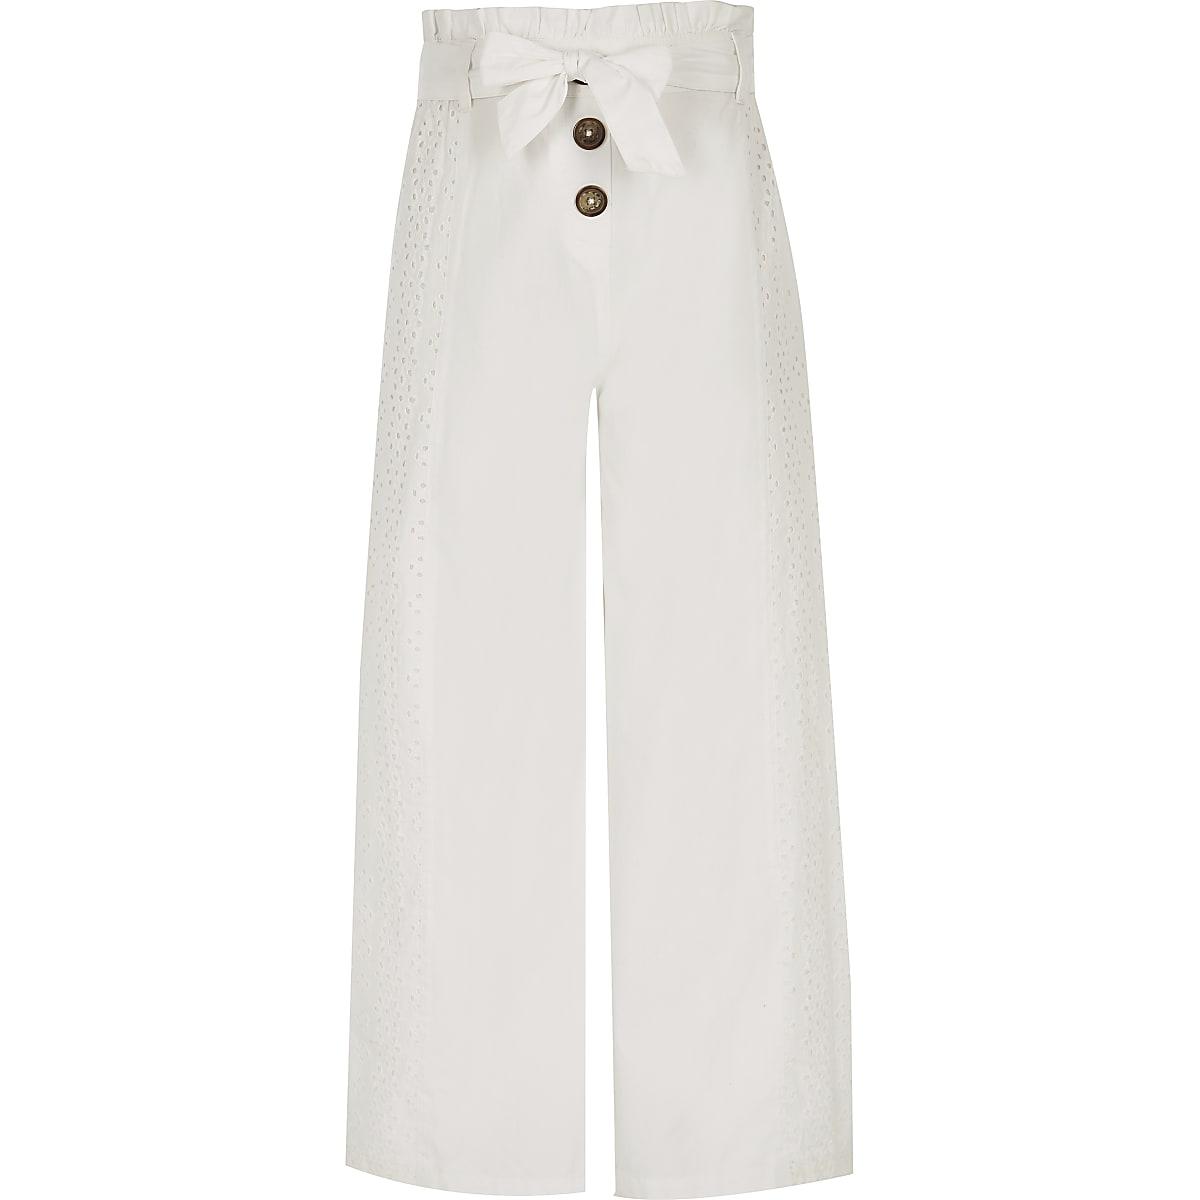 Girls white broidery wide leg pants